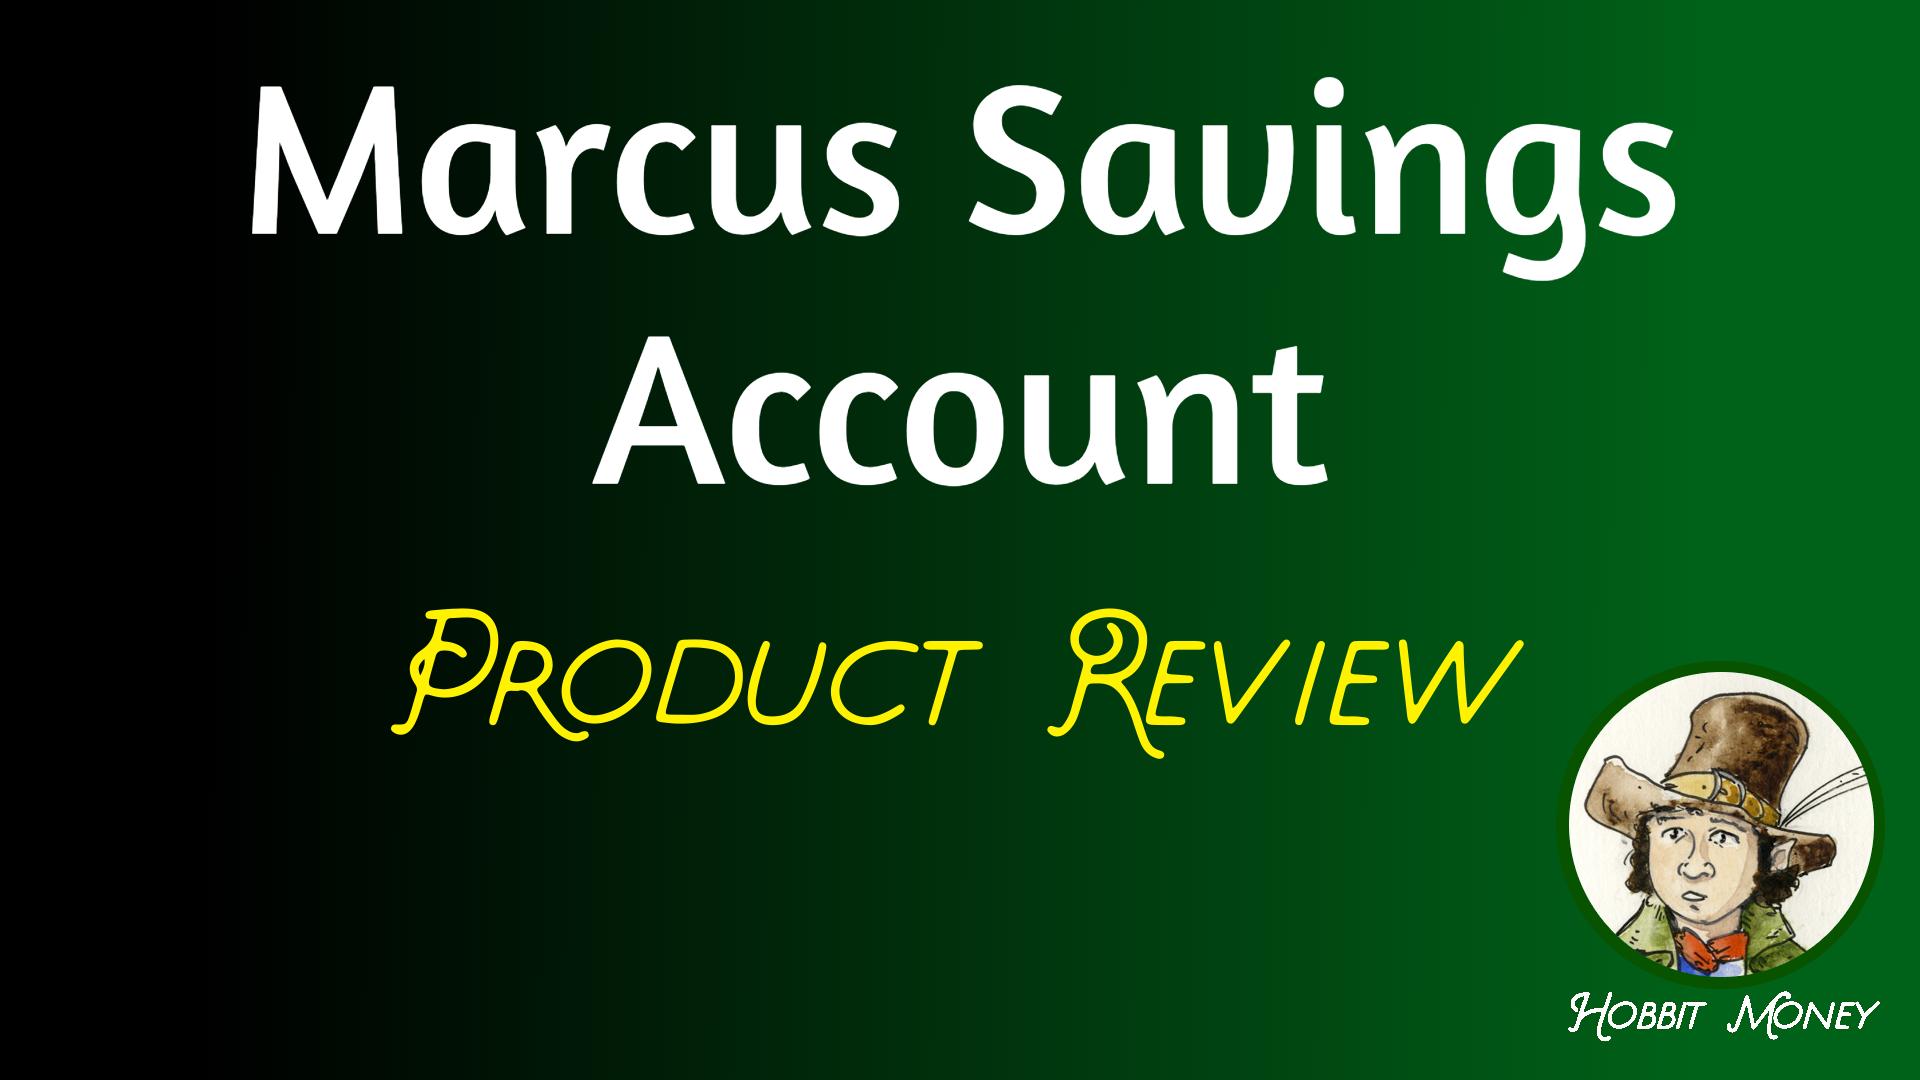 Marcus savings account product review - hobbit money